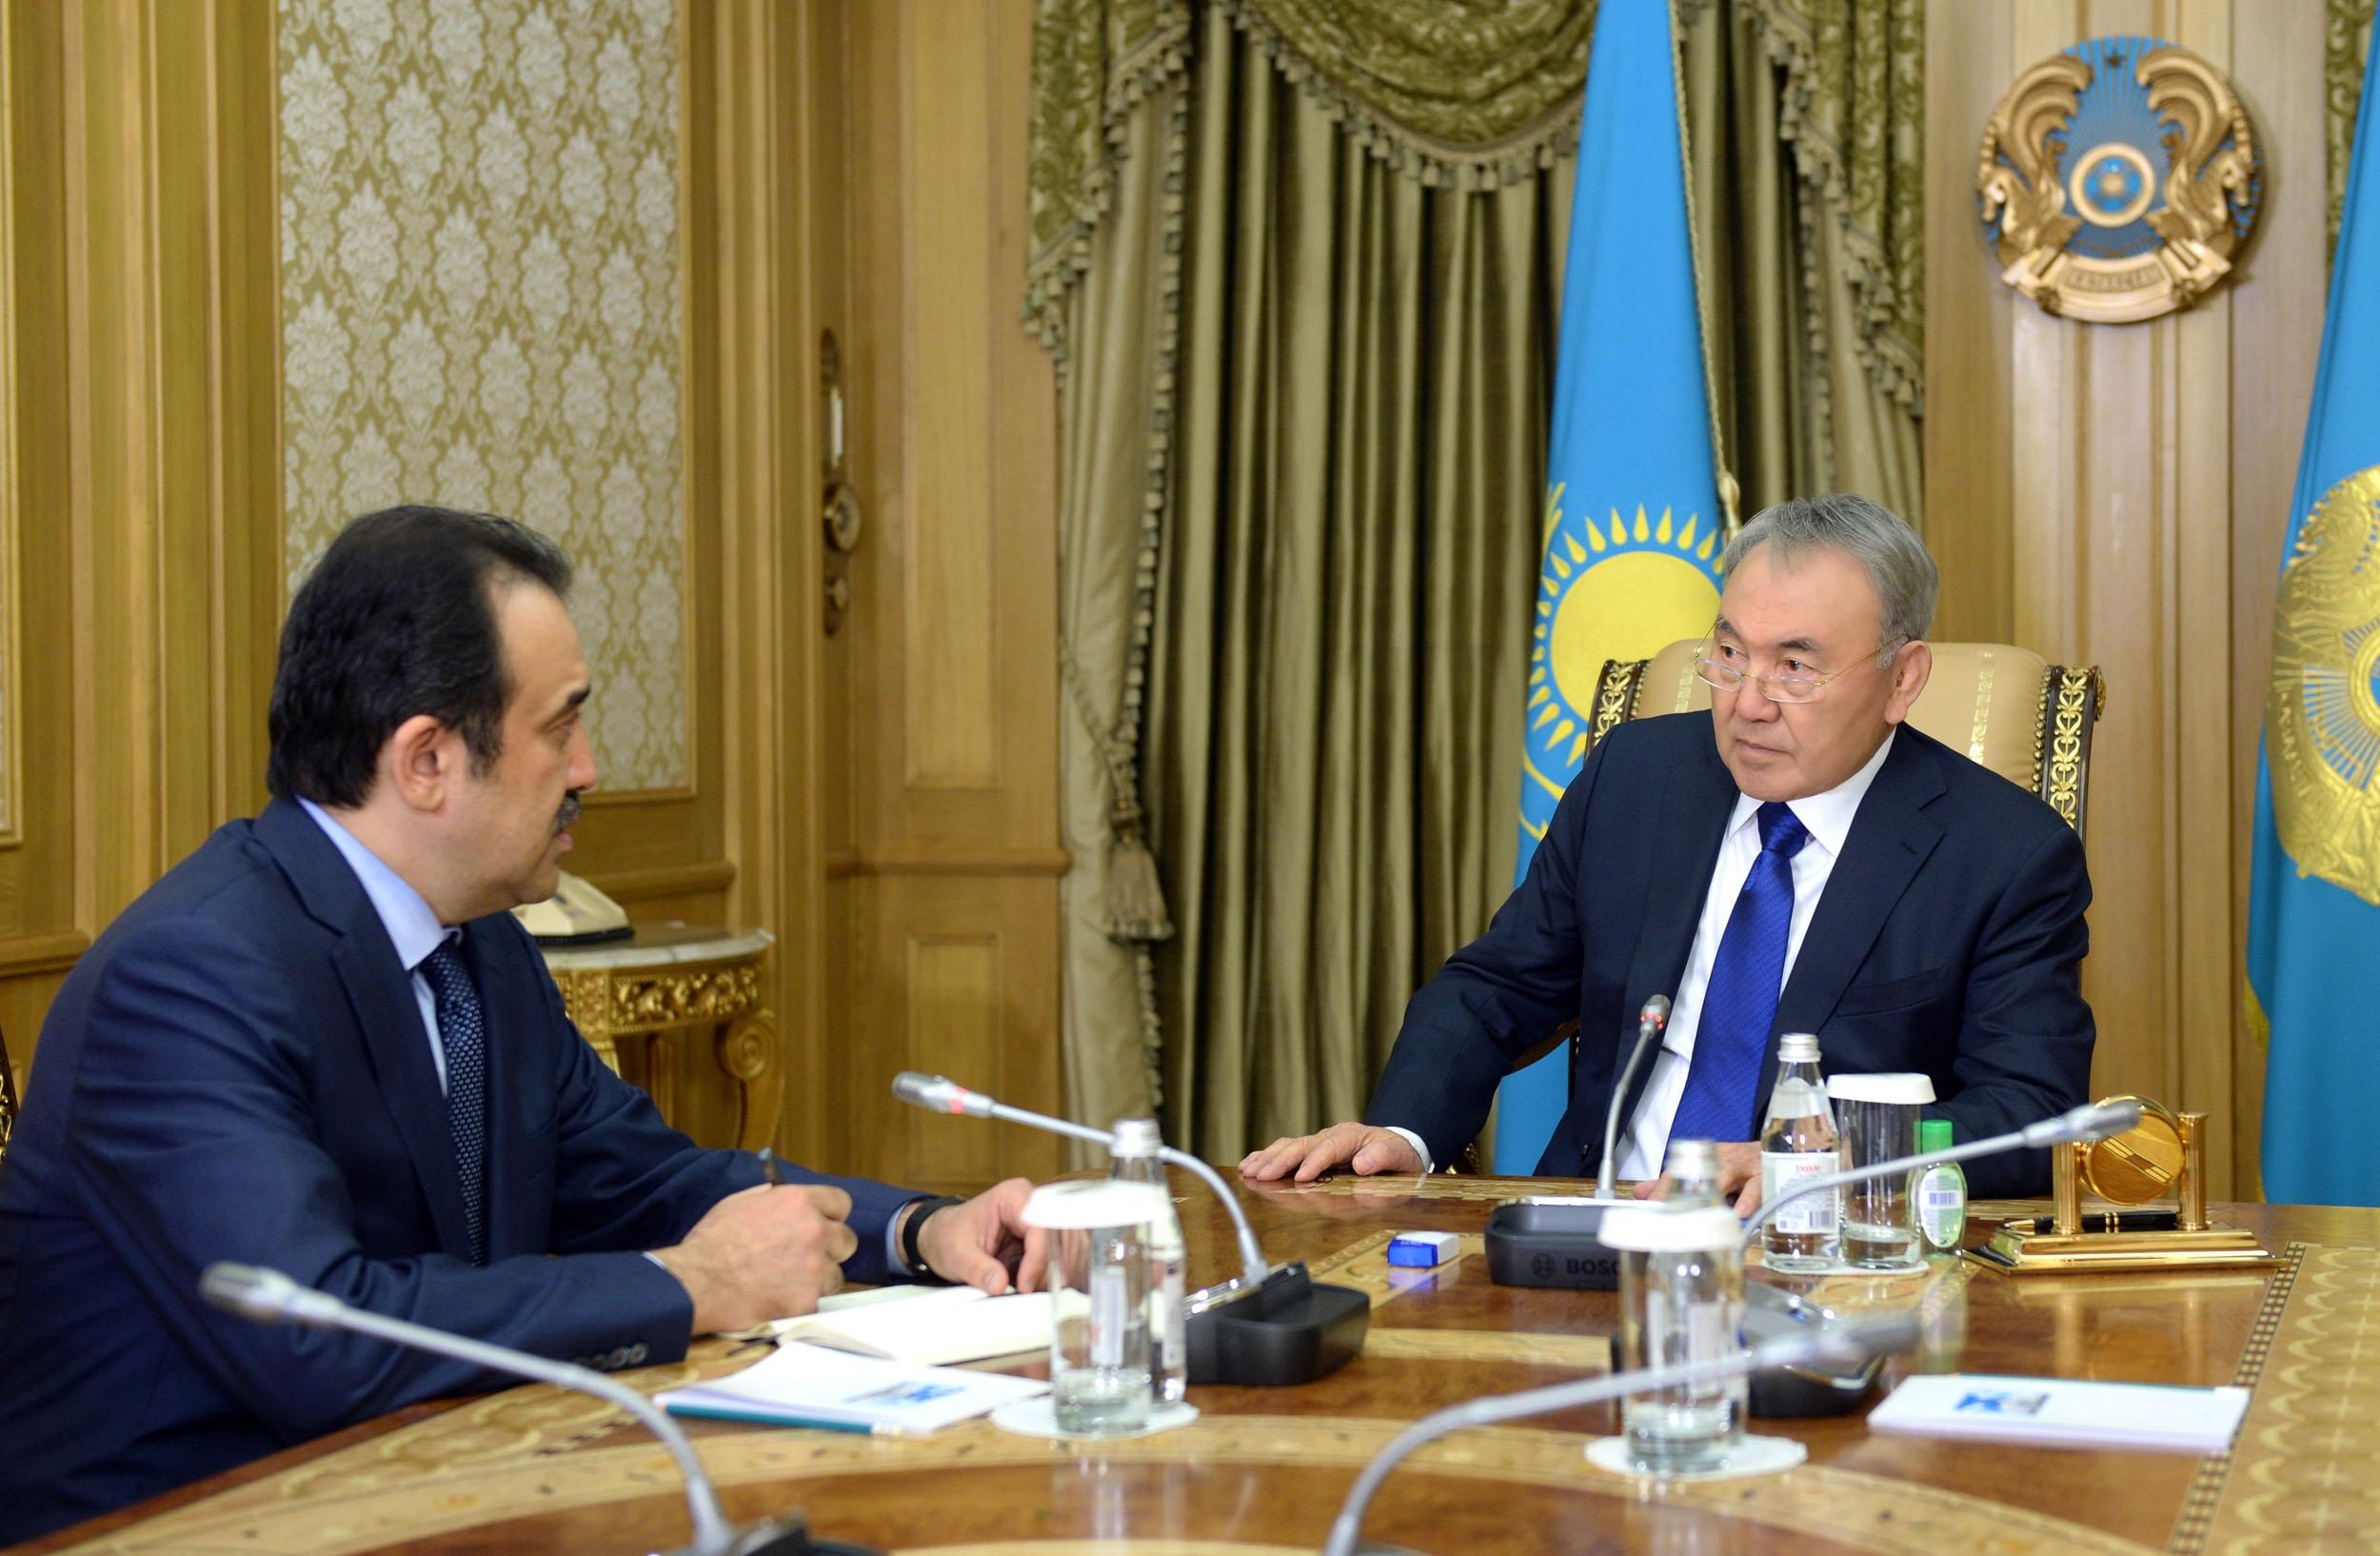 Назарбаев отметил работу нацкомиссии по модернизации